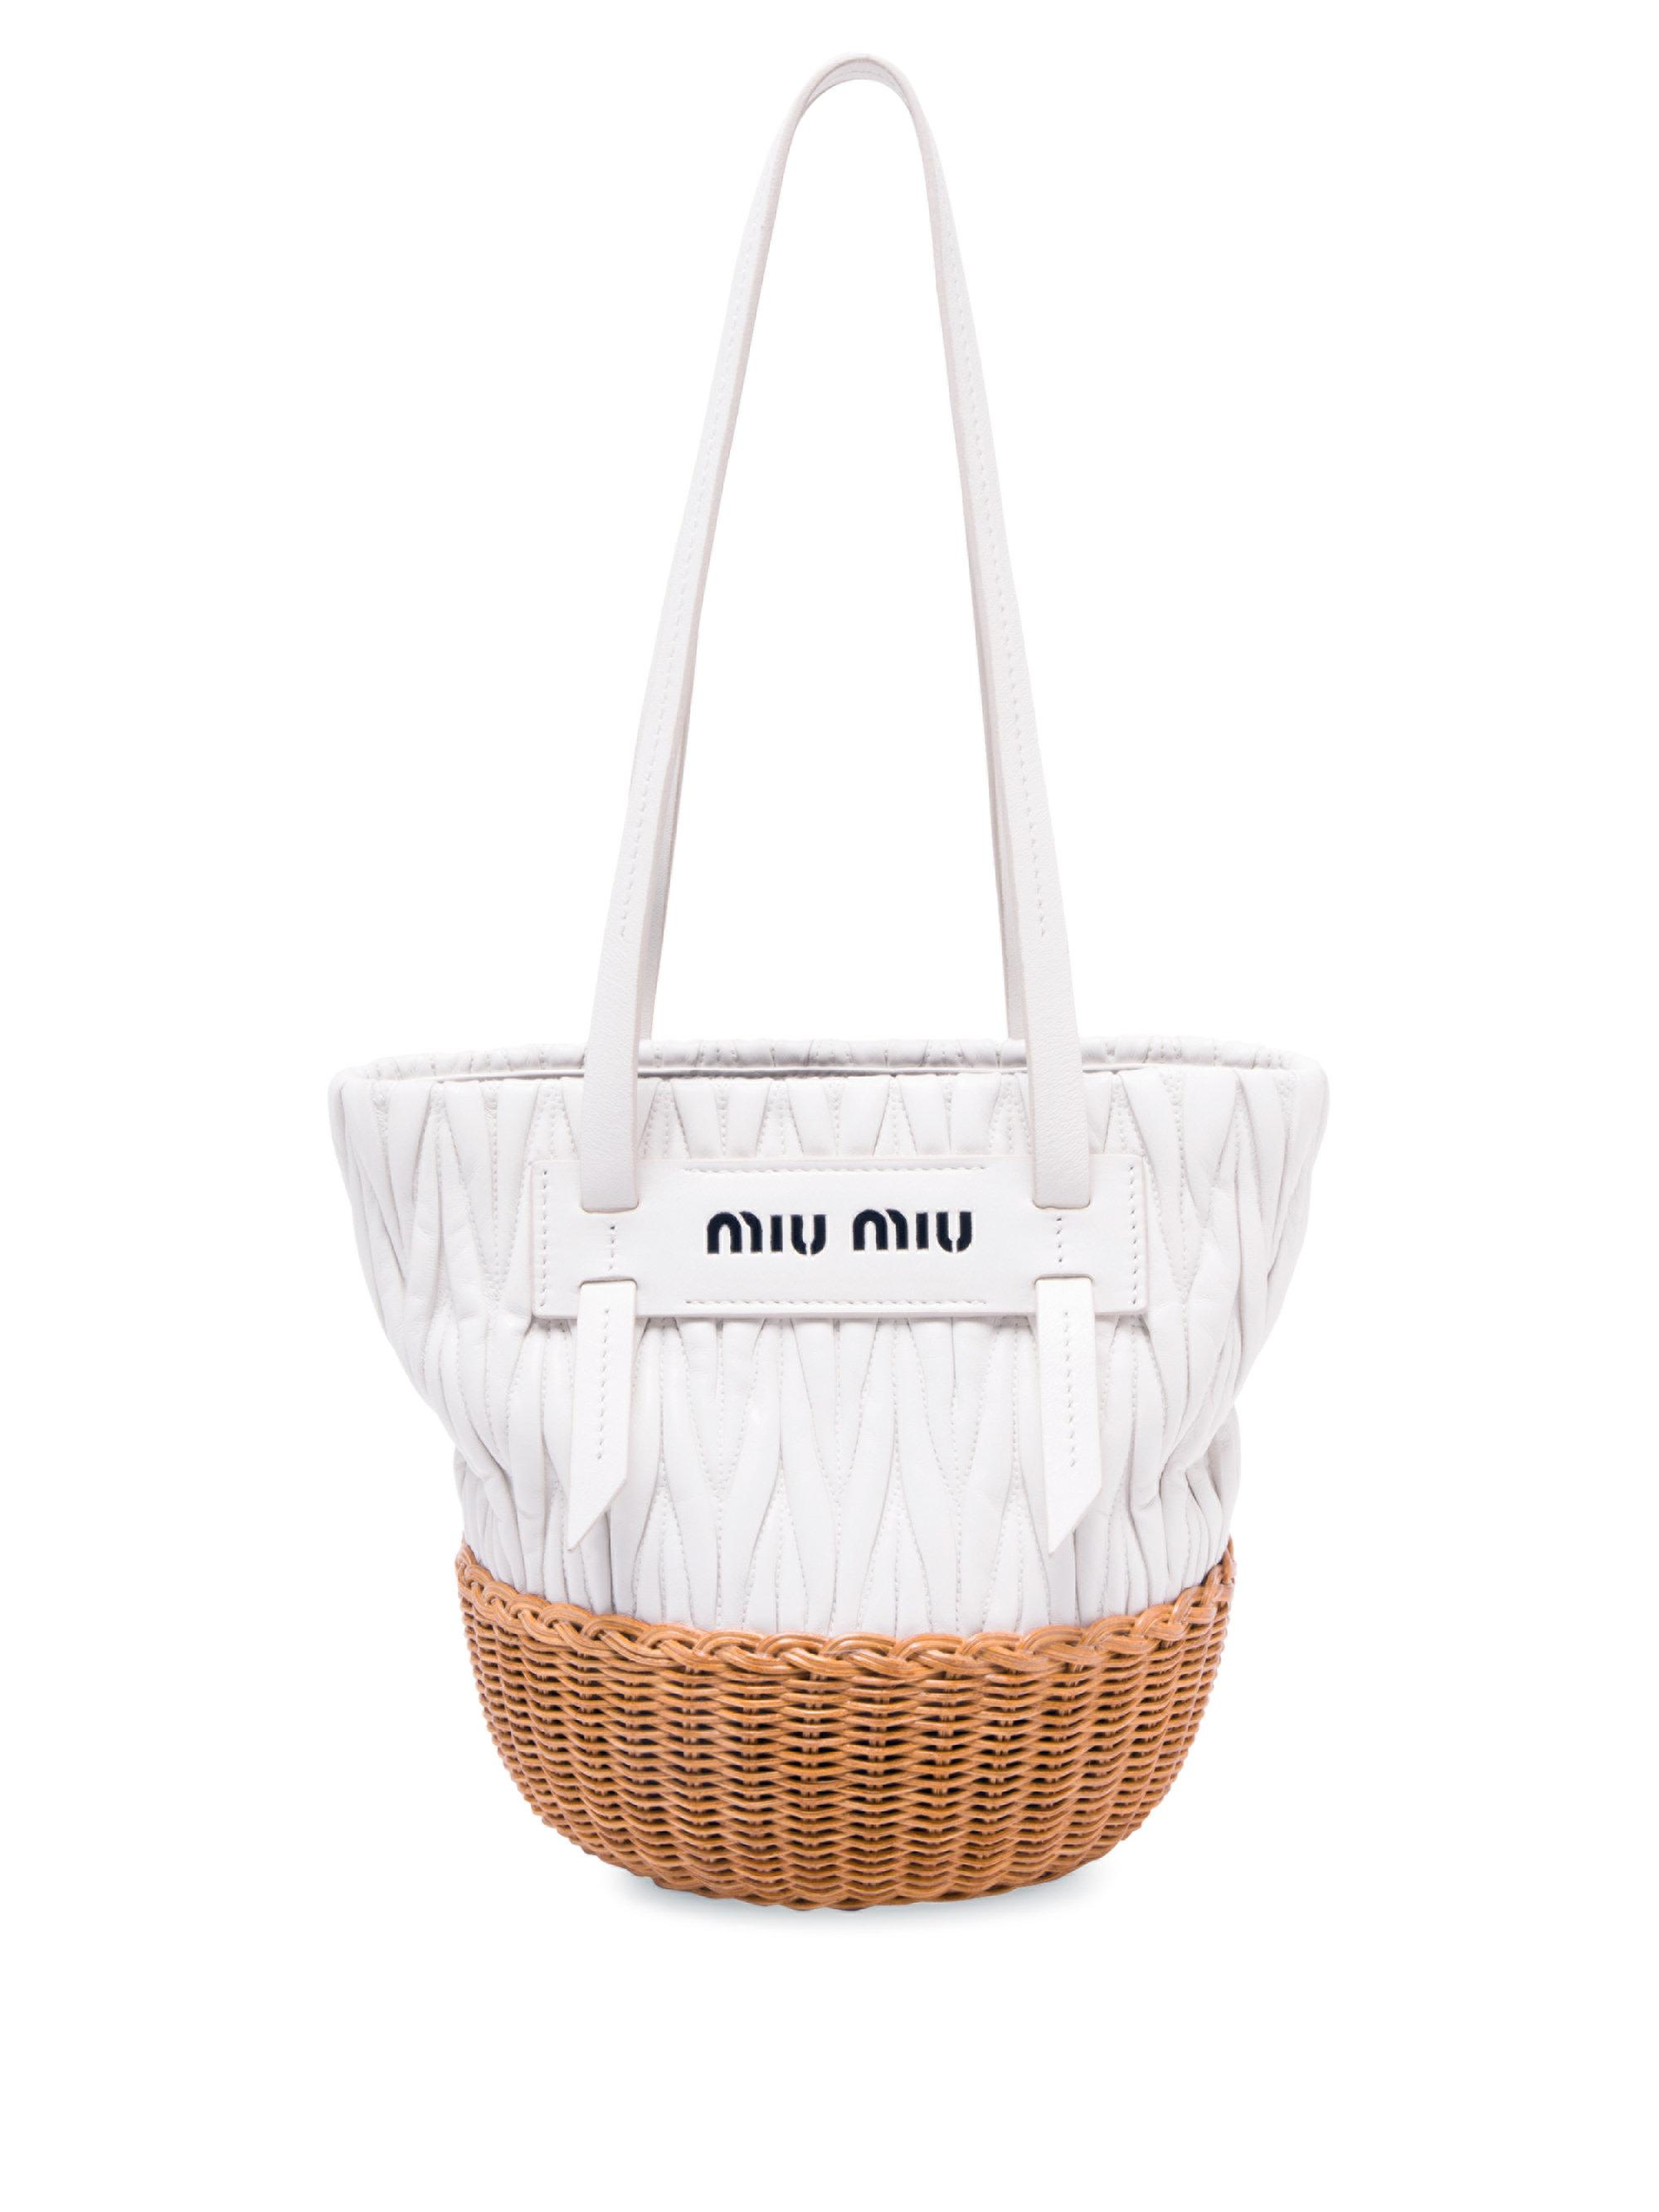 official photos a5f54 4da0c miu-miu-white-Textured-Leather-Basket-Bag.jpeg